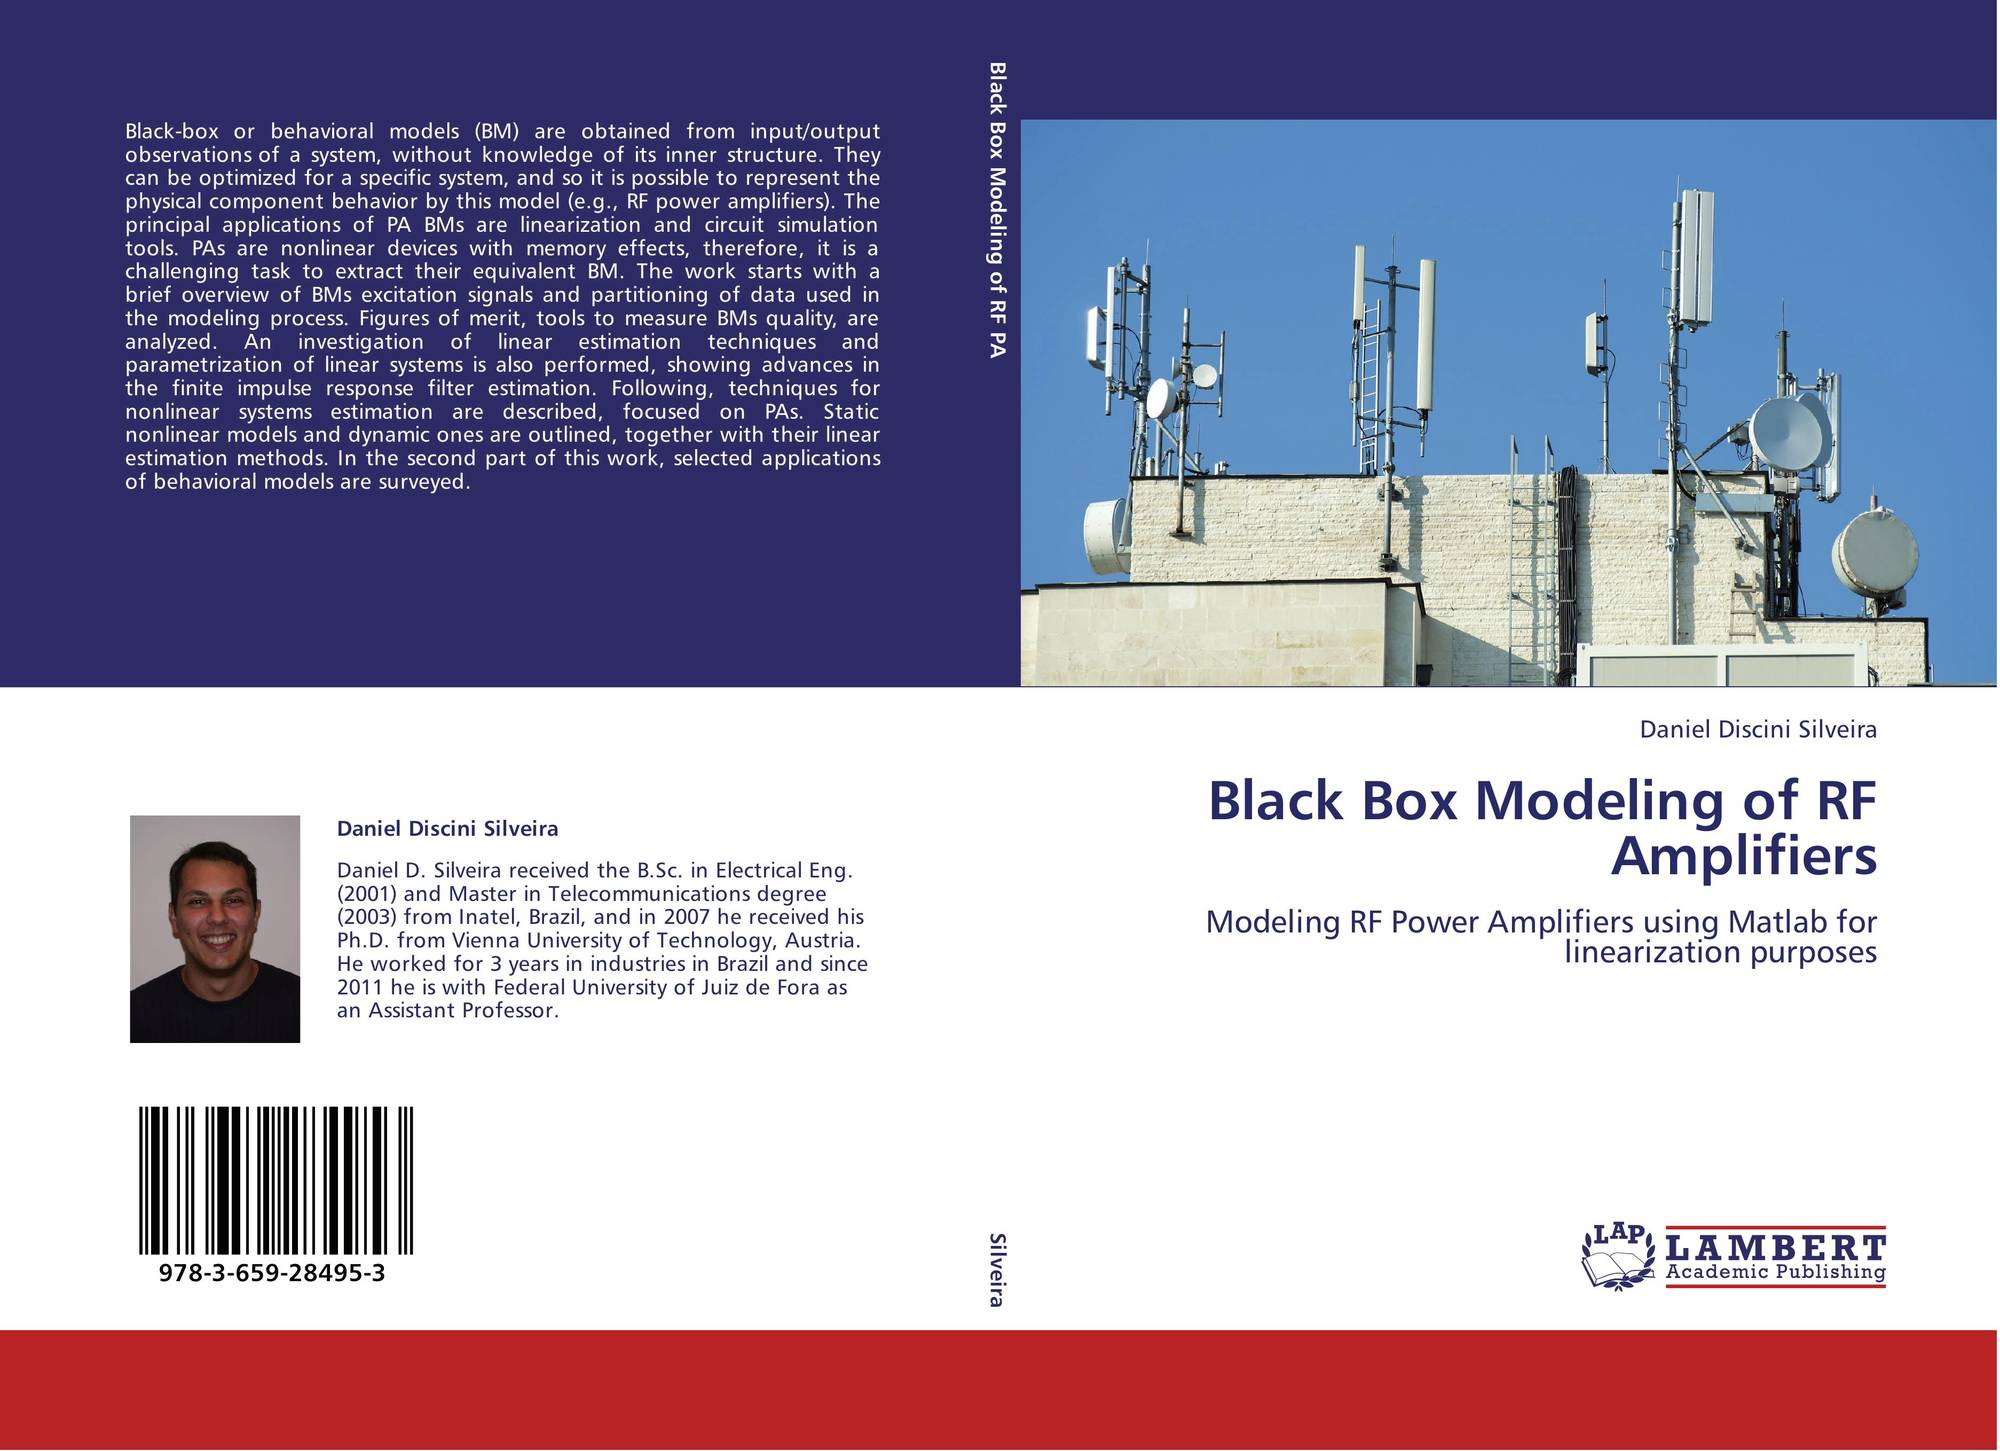 Black Box Modeling Of Rf Amplifiers 978 3 659 28495 3659284955 Diagram 9783659284953